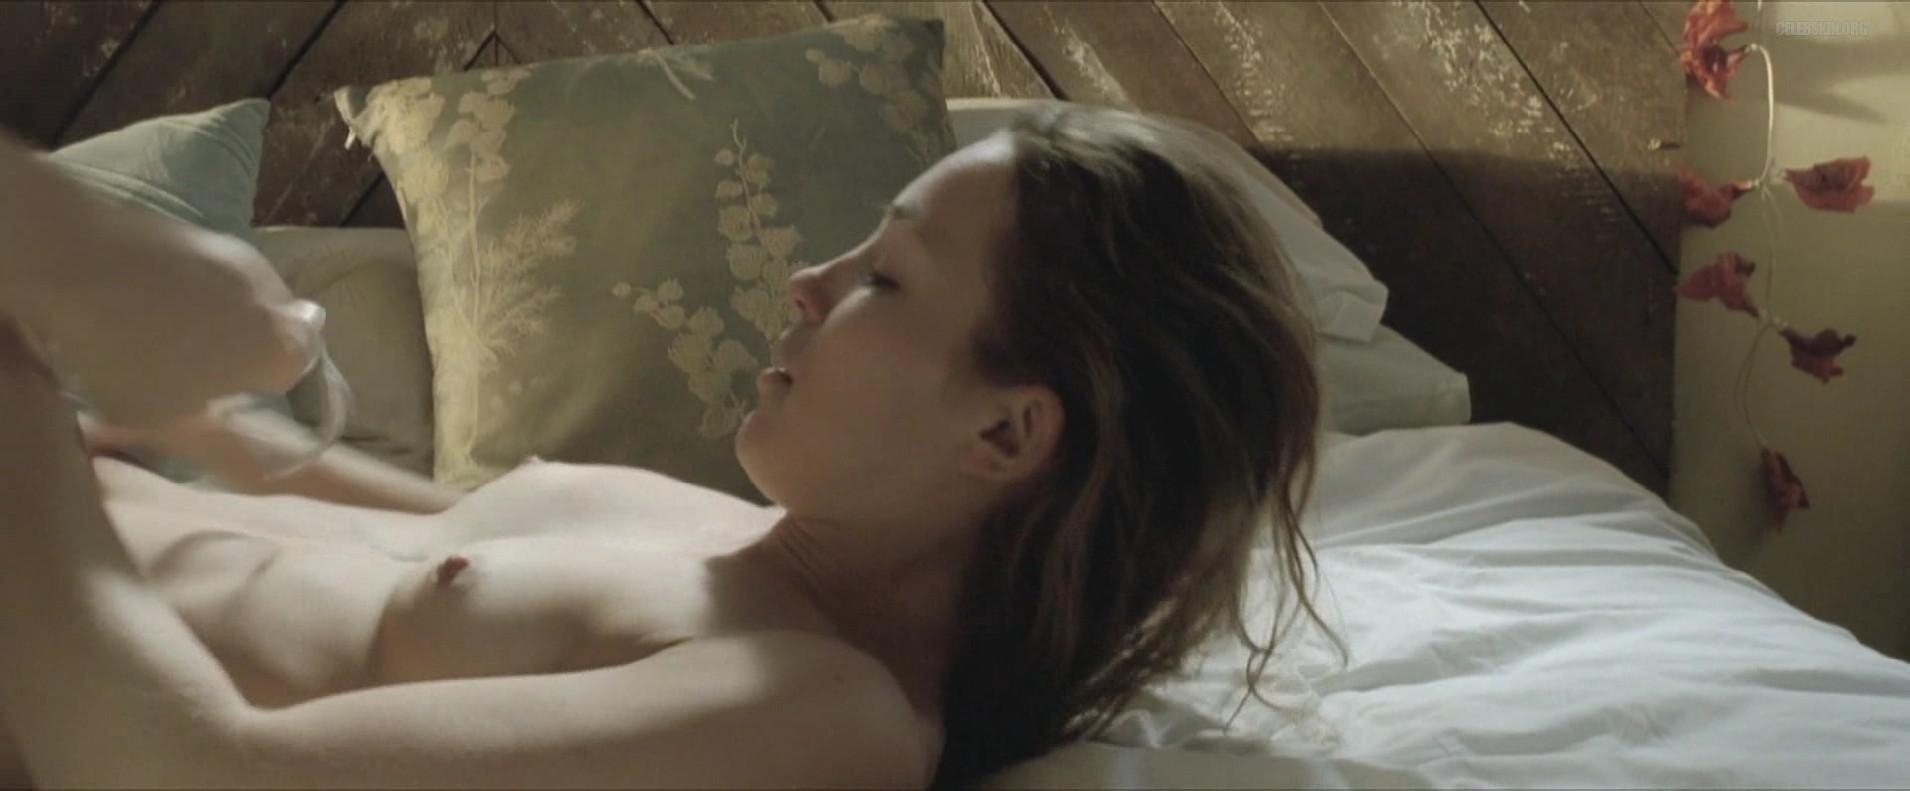 sex scene from weeks